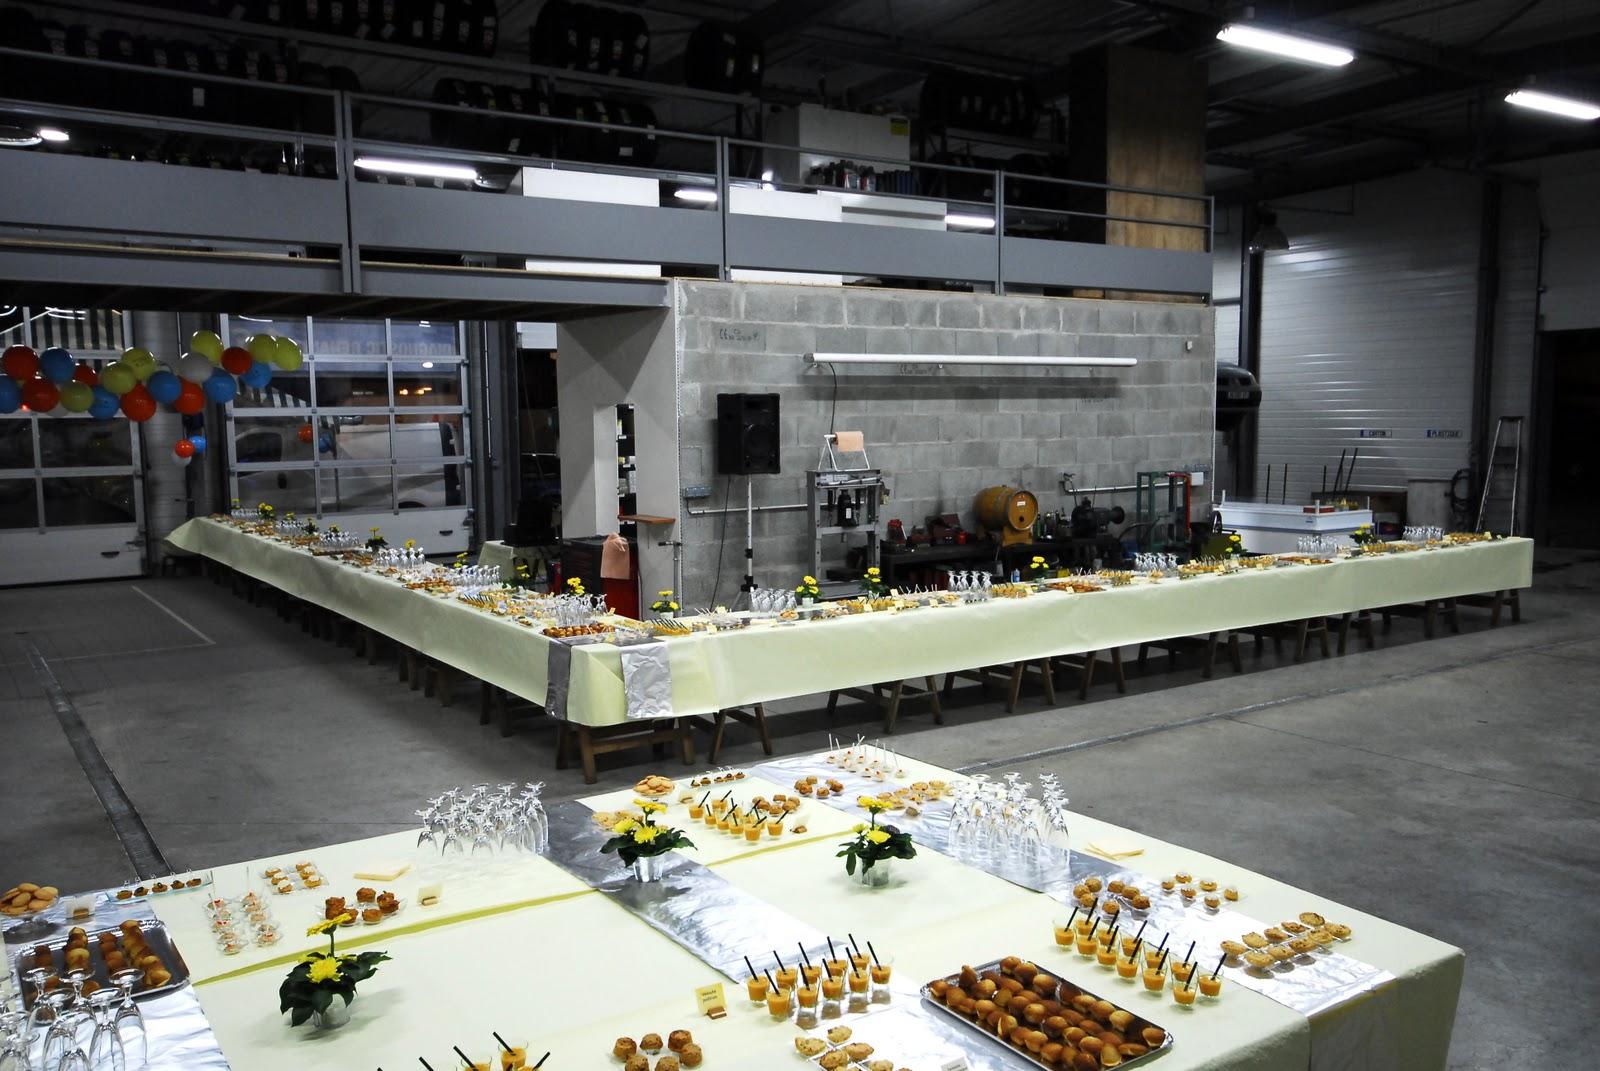 Cuisine couleurs saveurs garage de l 39 oc an chantonnay - Garage renault chantonnay ...